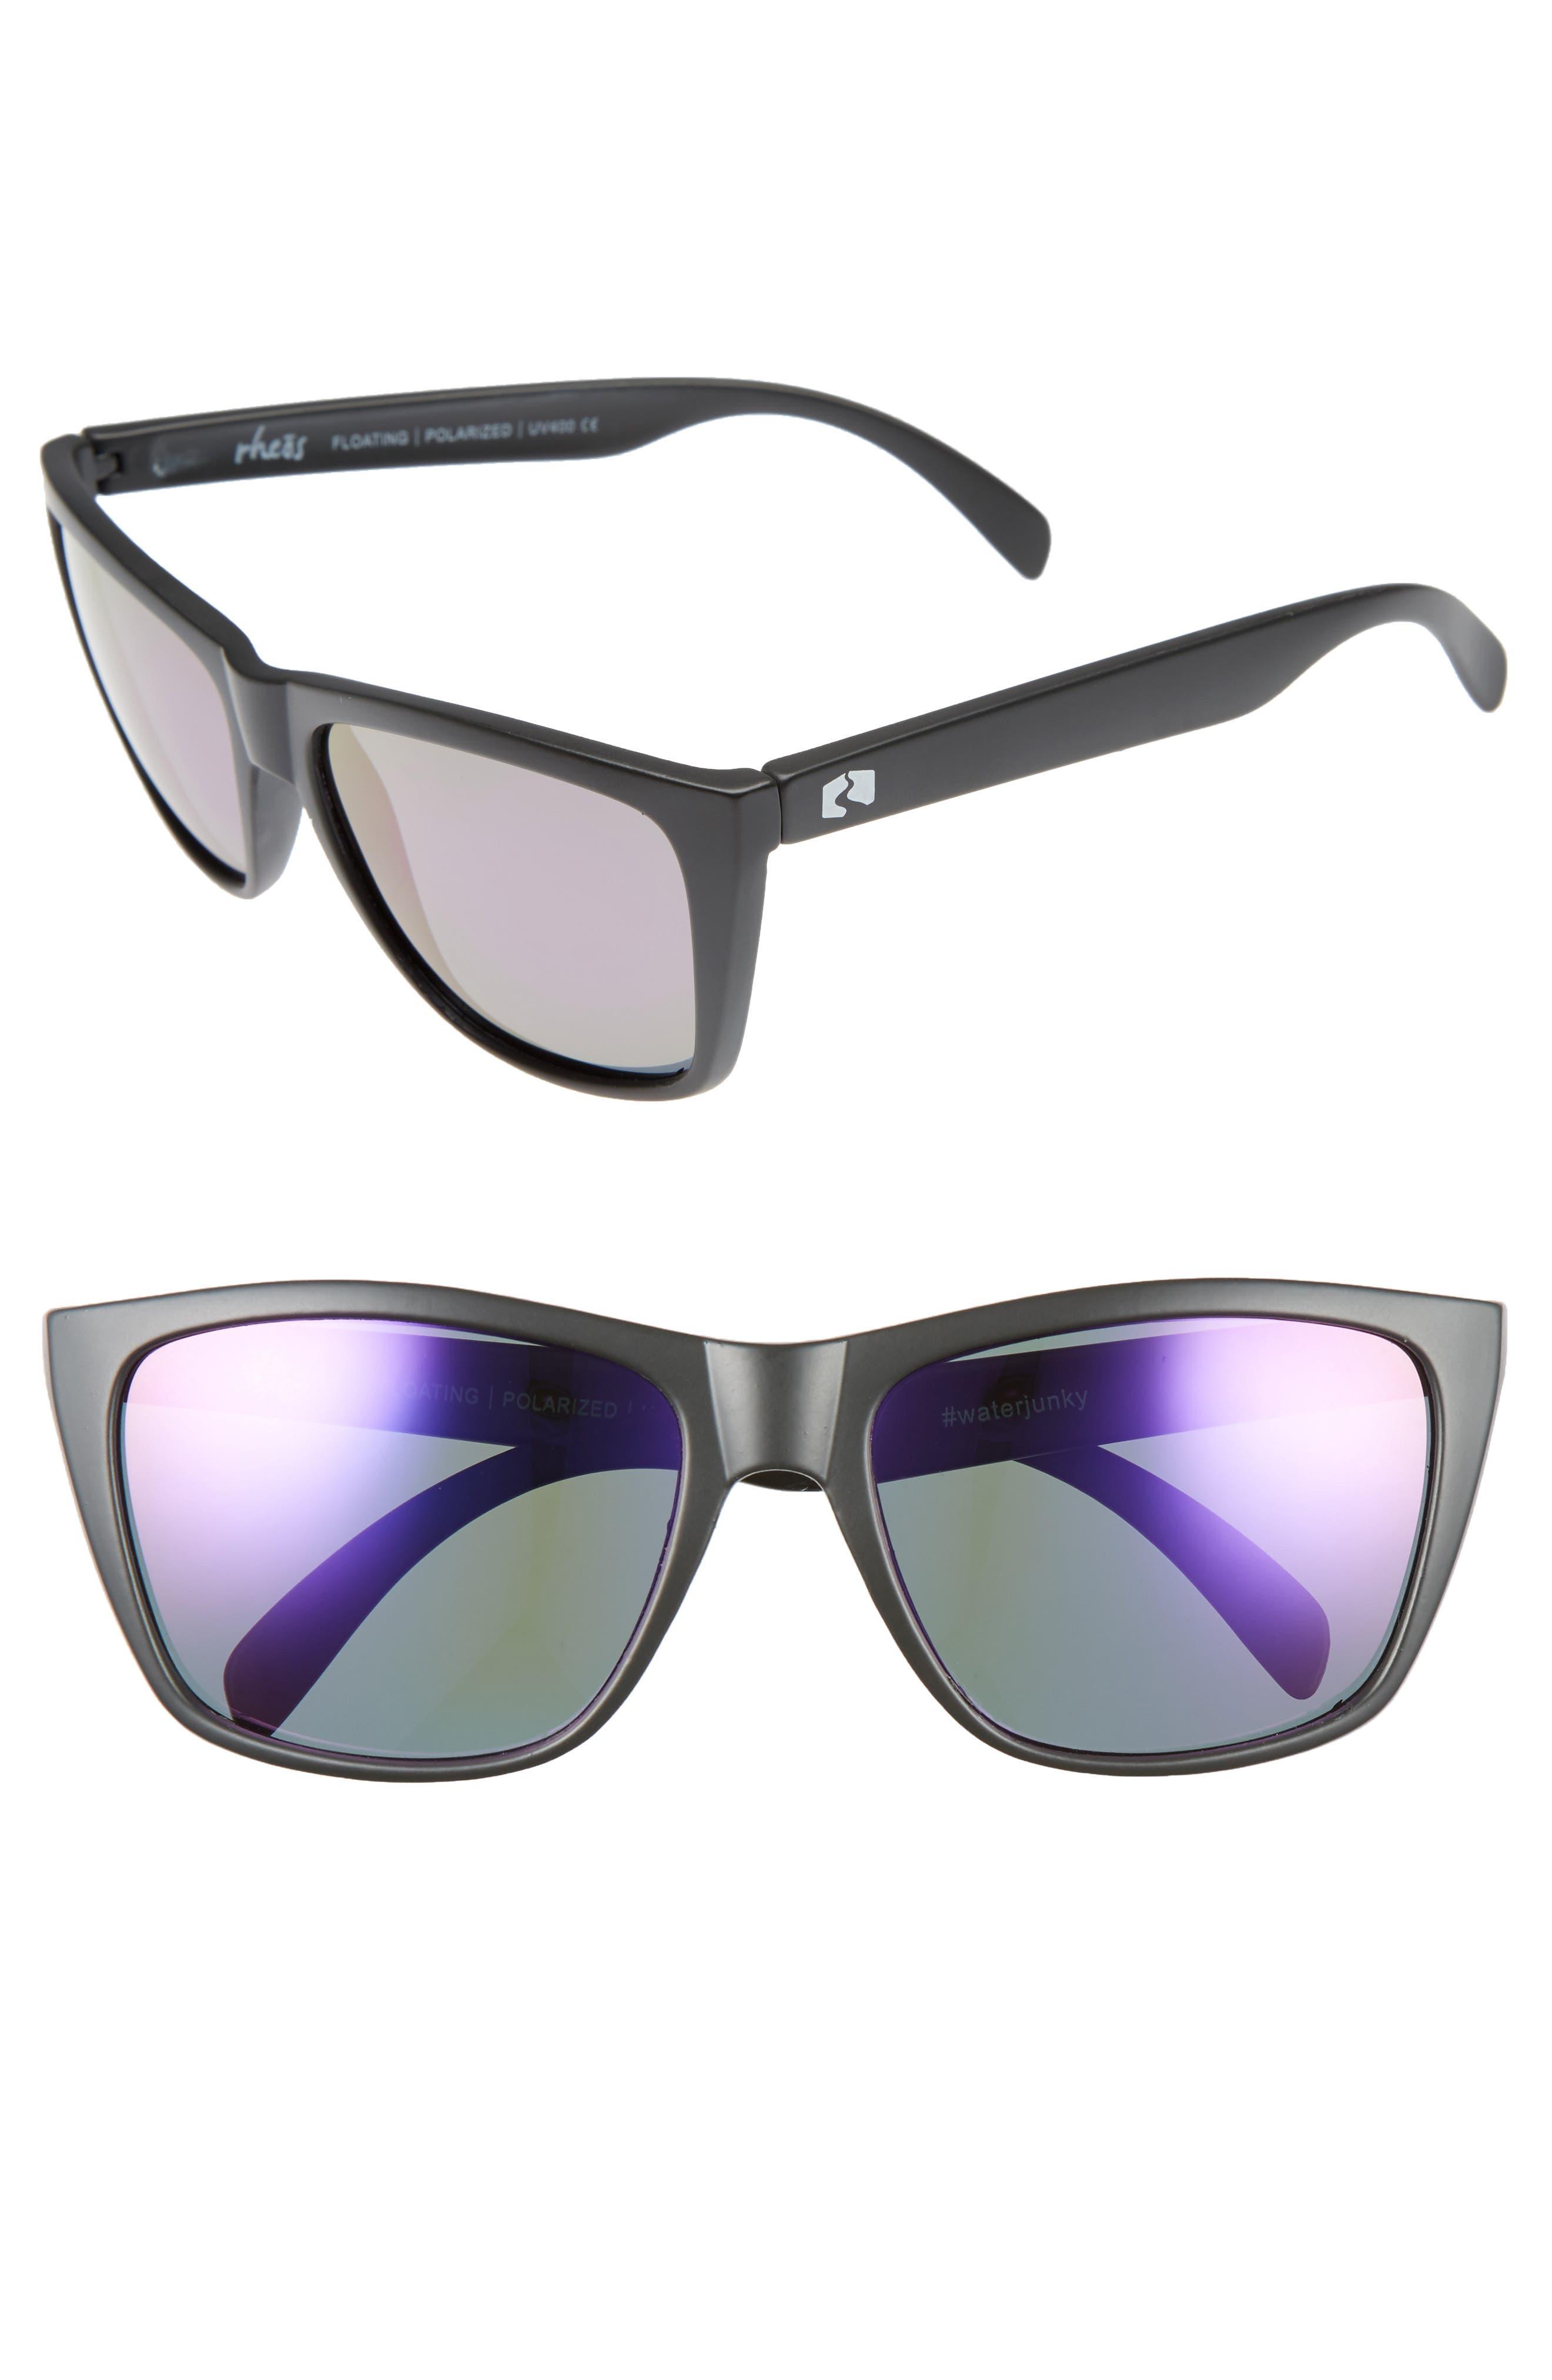 Main Image - Rheos Sapelos Floating 61mm Polarized Sunglasses